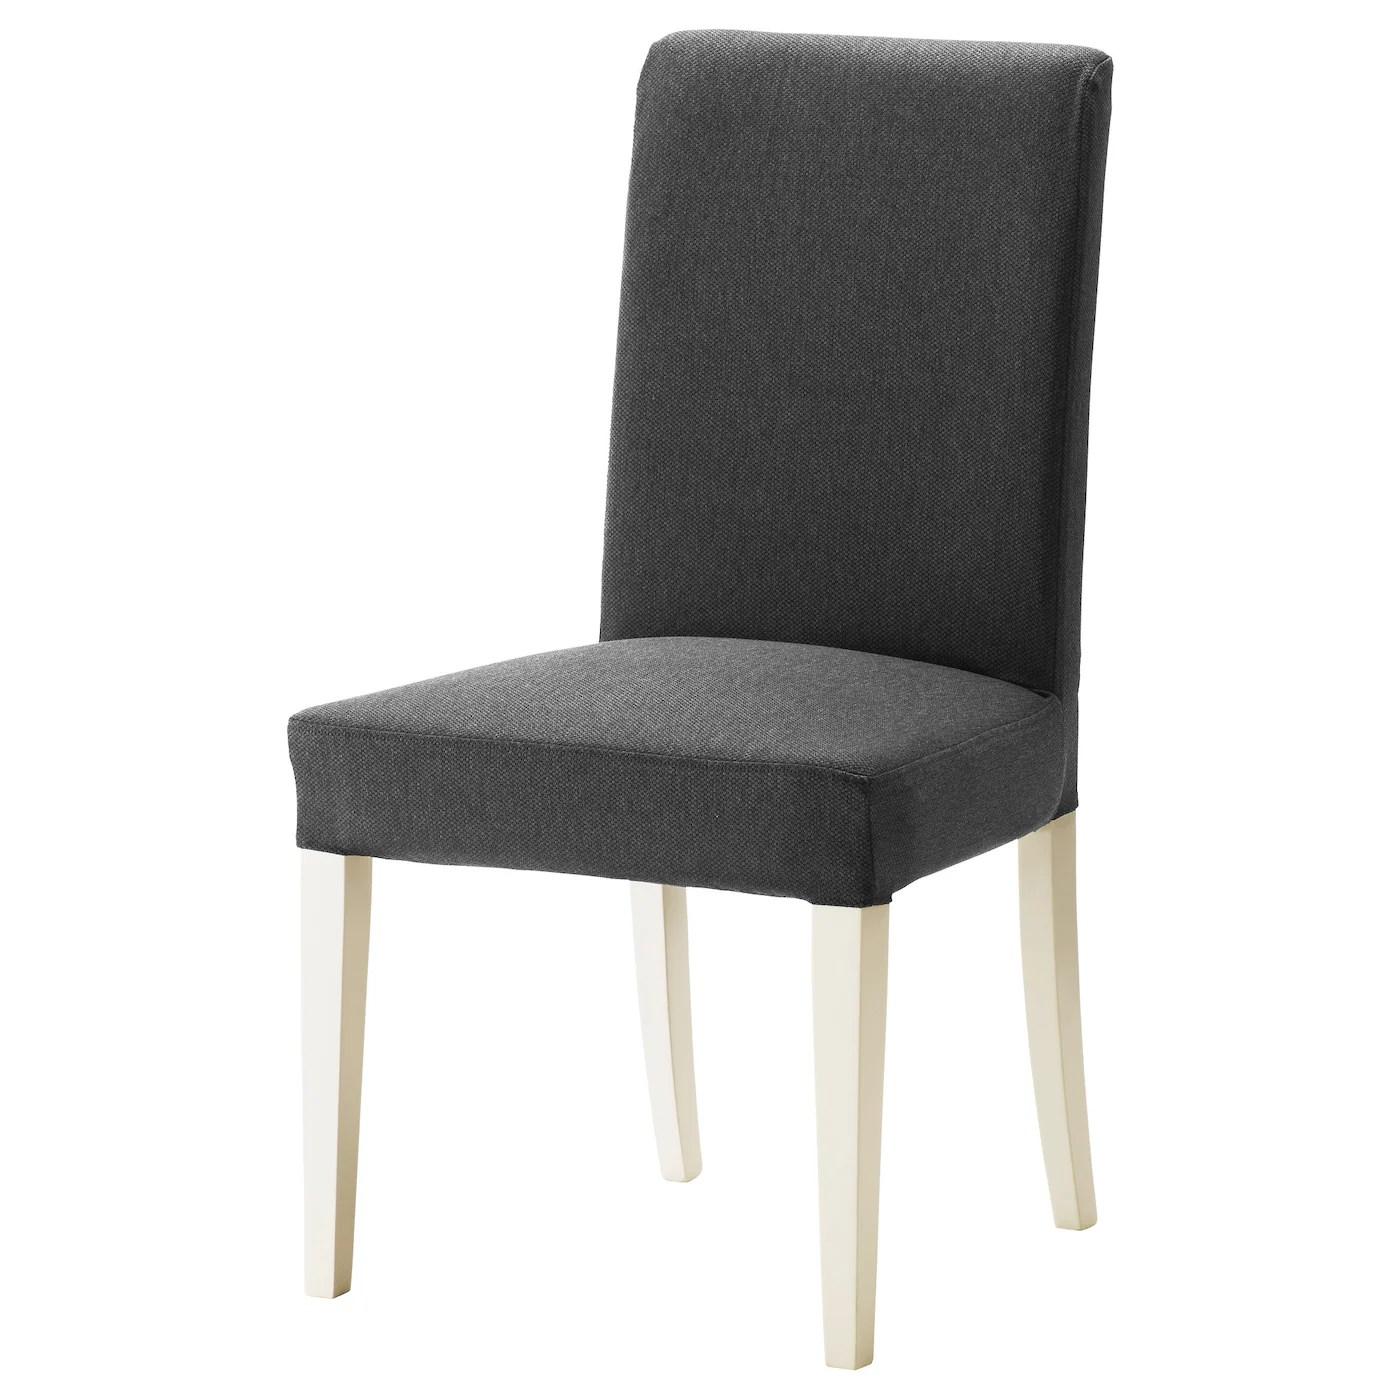 white chair ikea computer game henriksdal dansbo dark grey